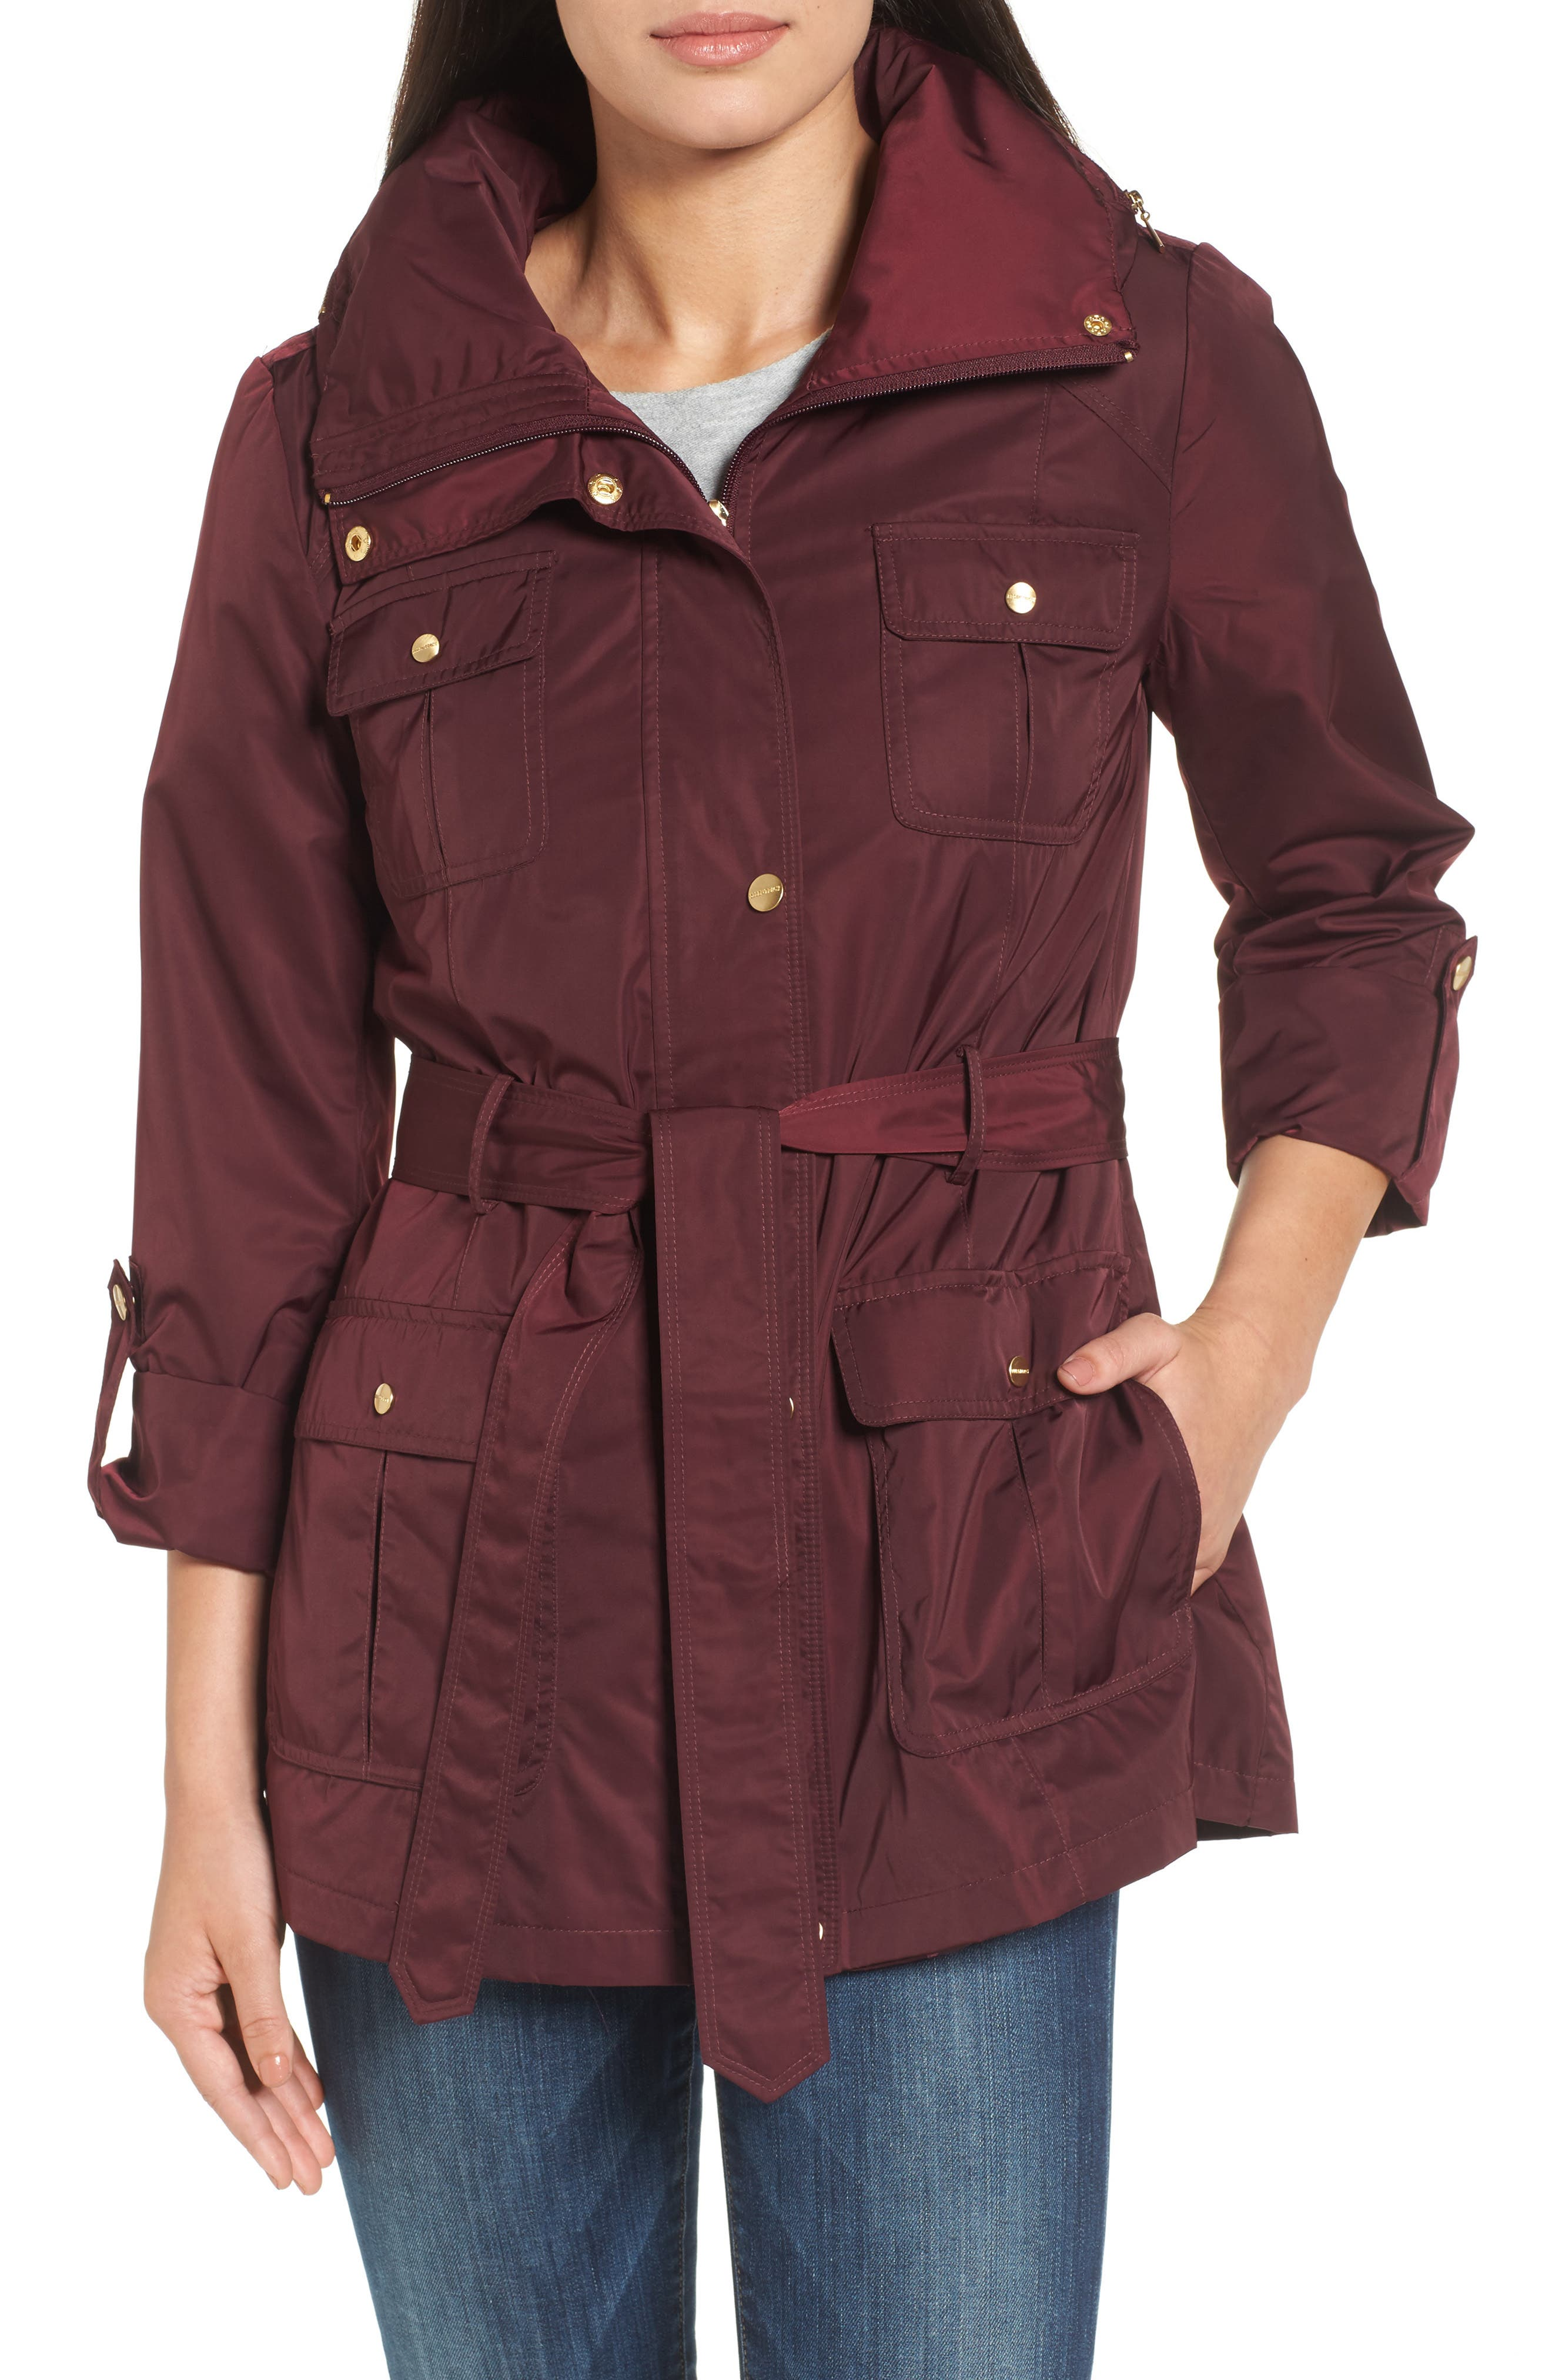 Techno Short Trench Coat,                             Main thumbnail 1, color,                             Burgundy